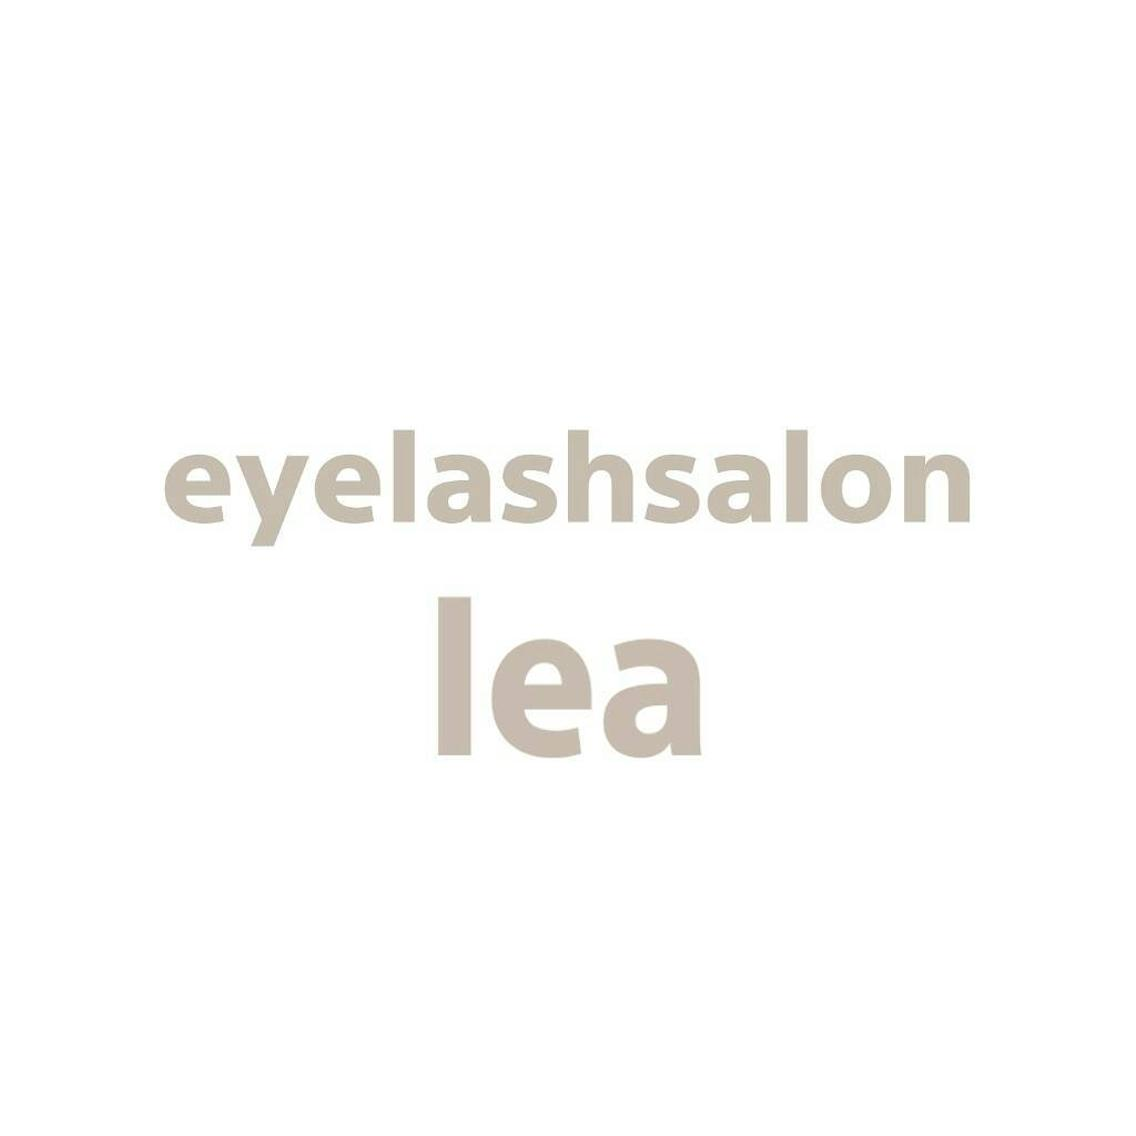 eyelashsalon lea所属・eyelashleaの掲載